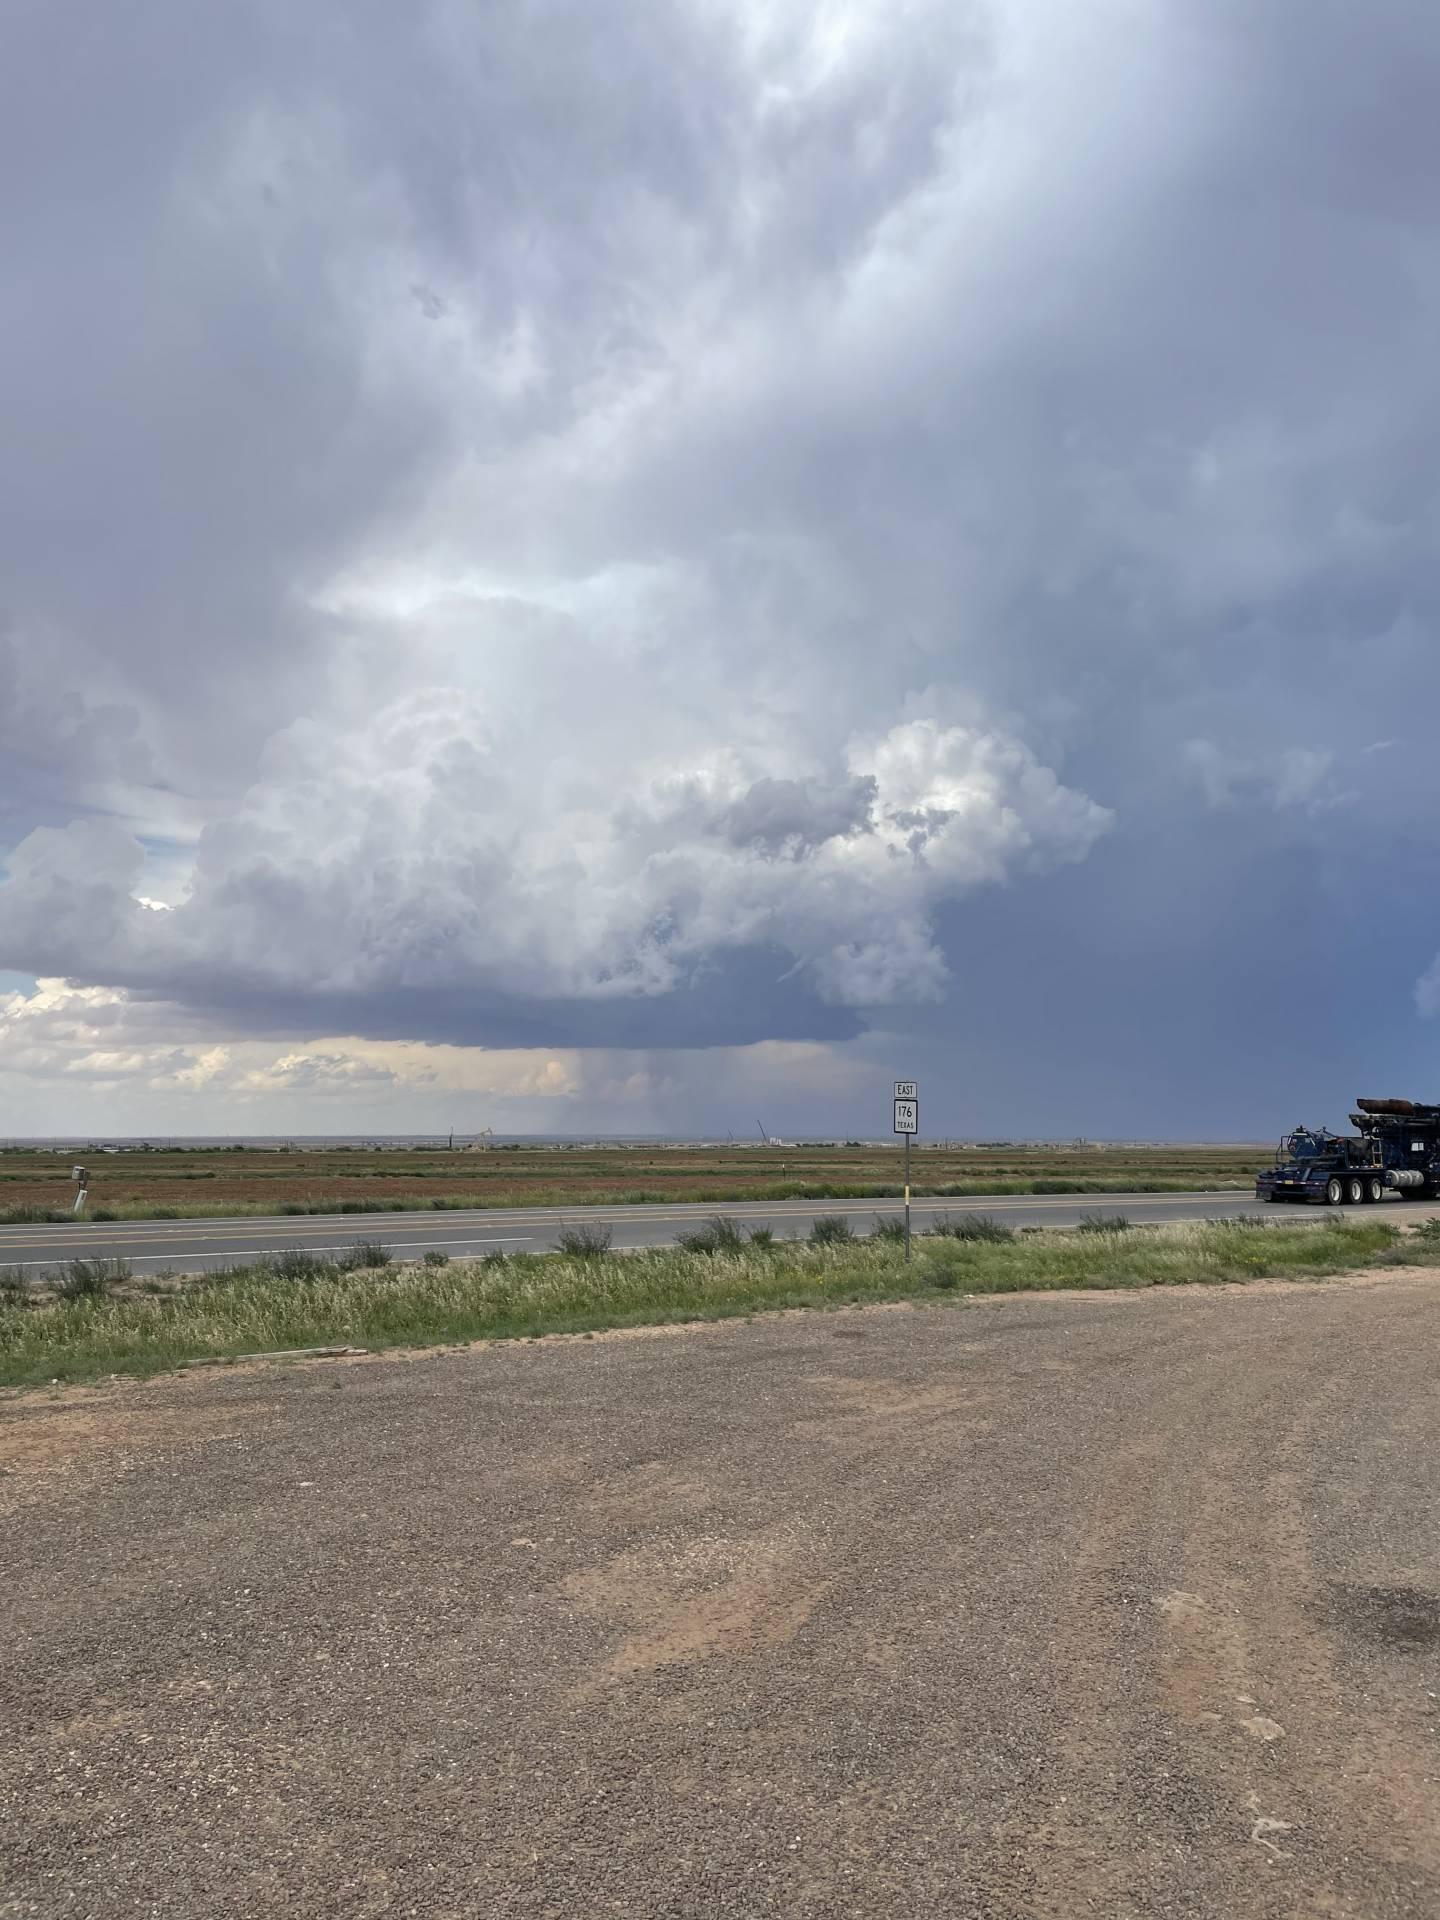 Persistent shear funnel near Lenorah, TX